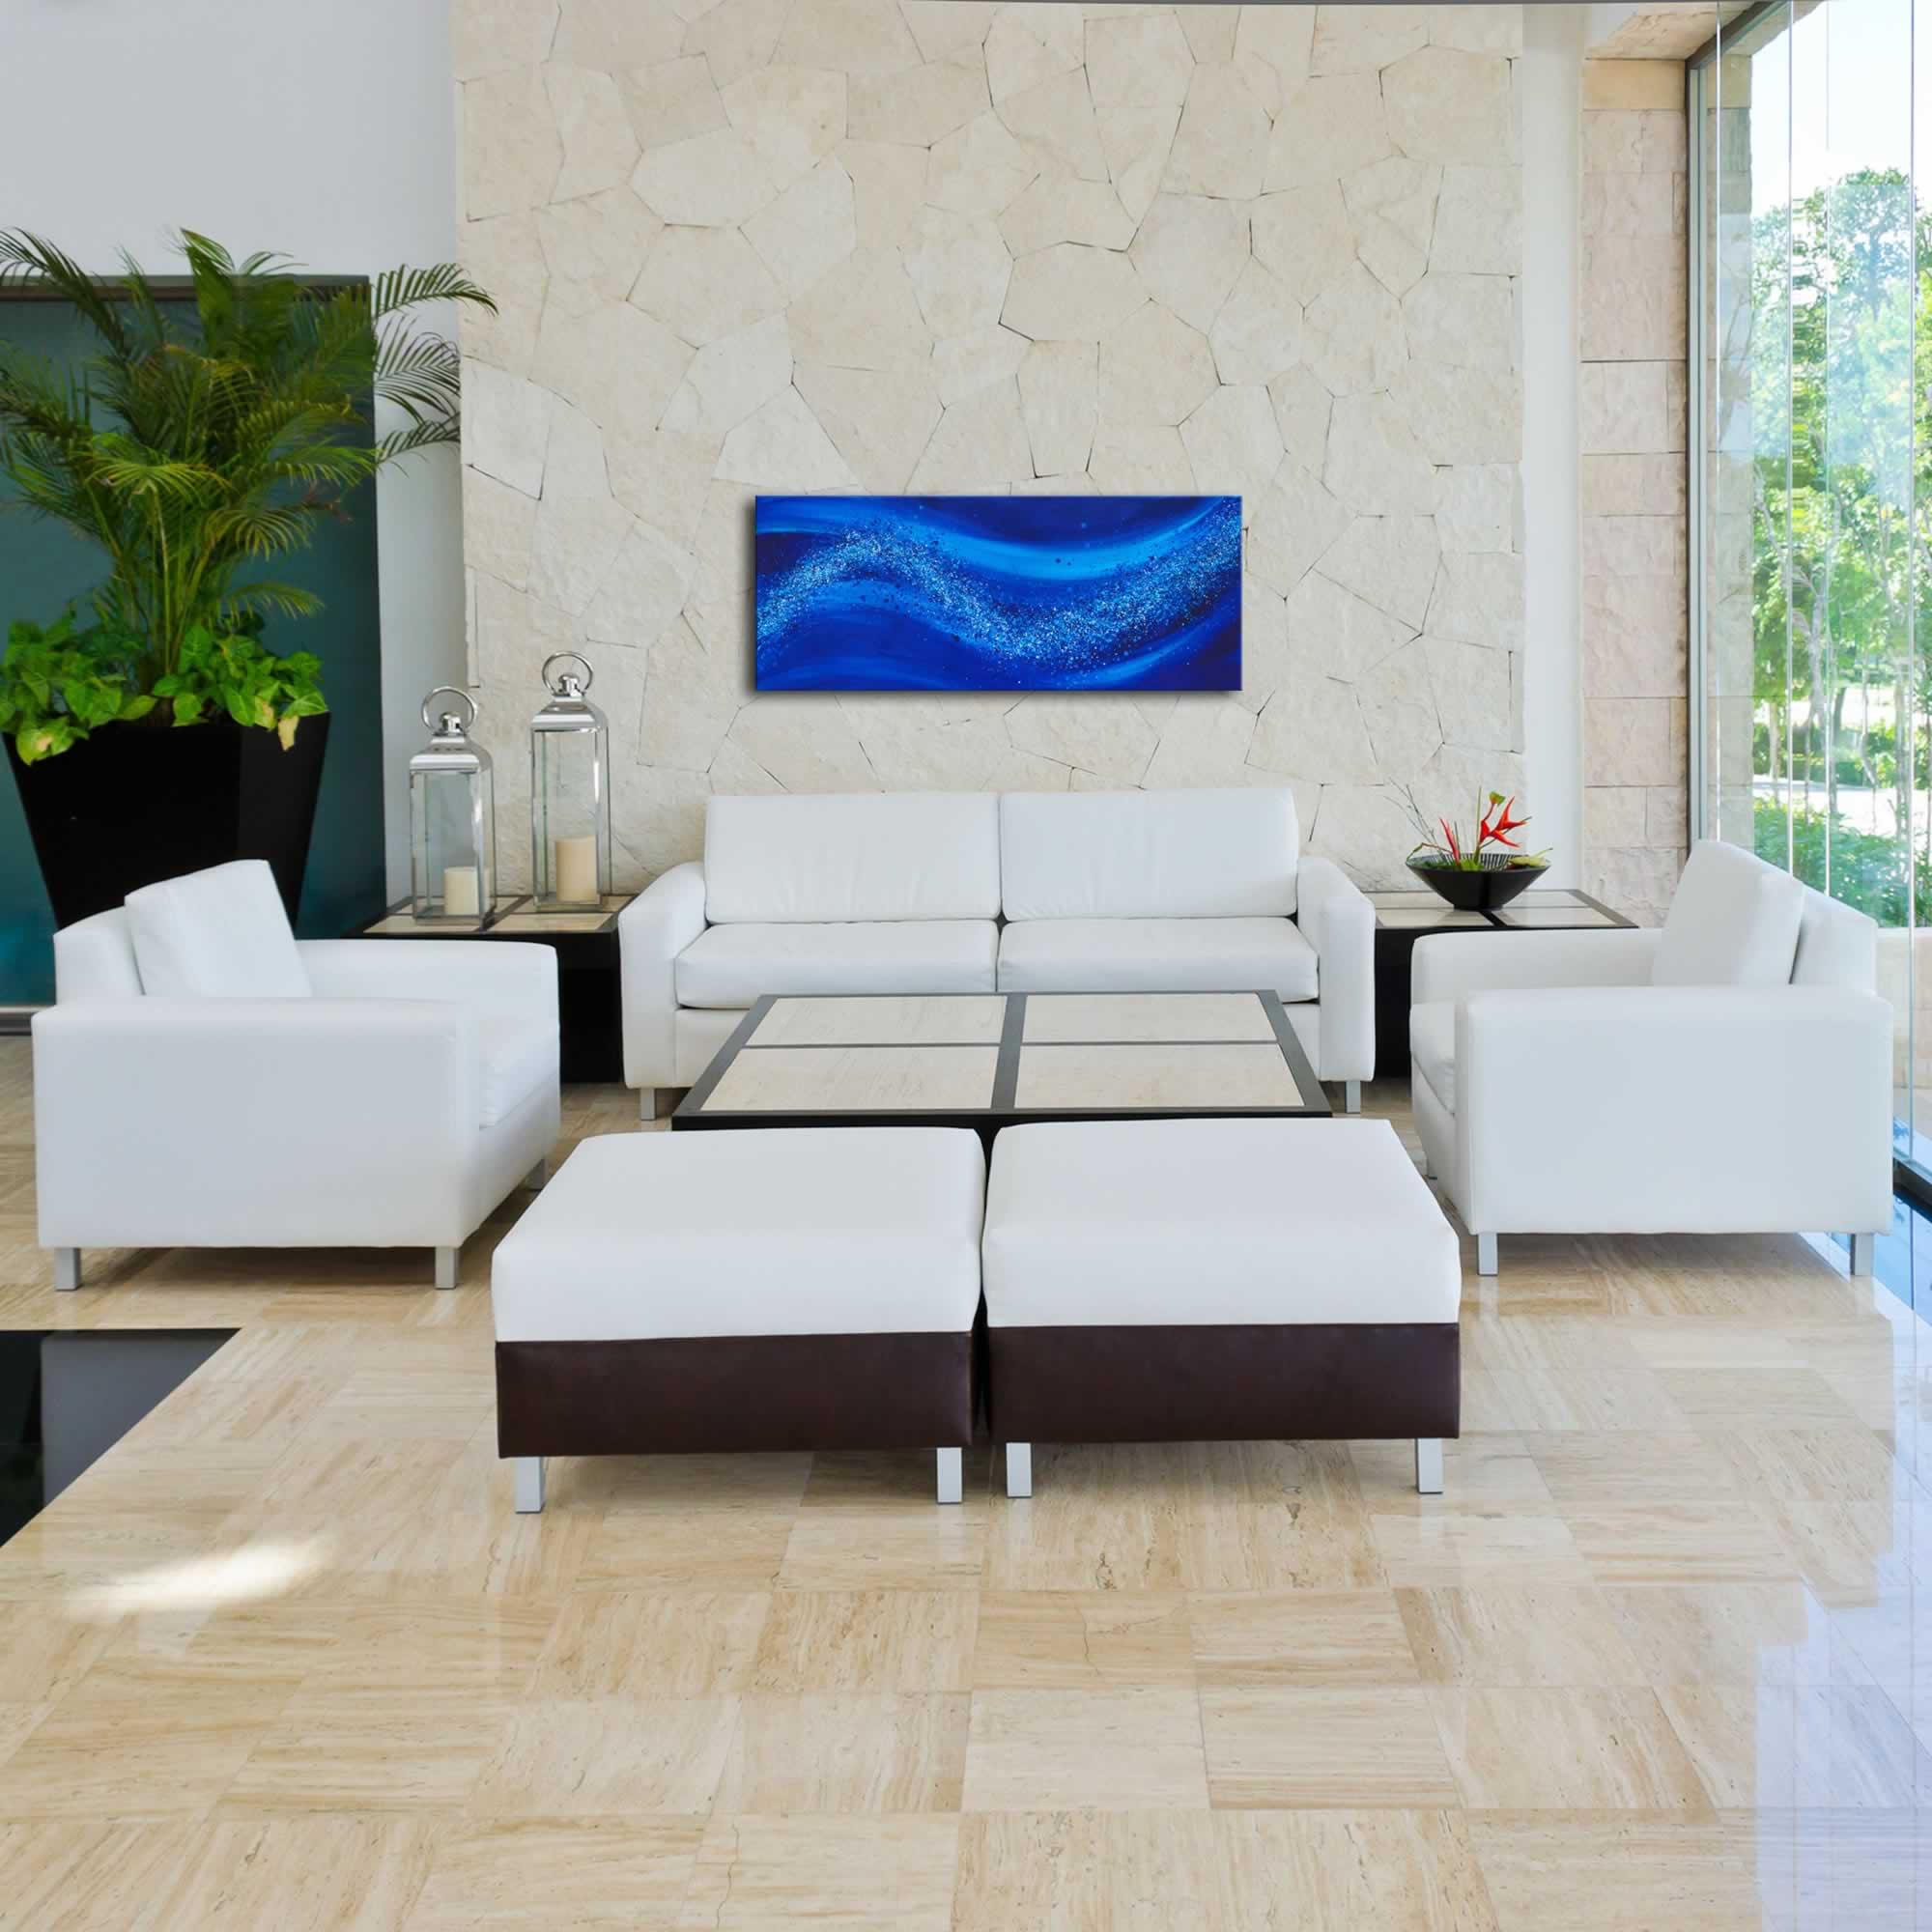 Beach Bliss - Blue & White Contemporary Abstract Artwork, Modern Ocean Wave Decor, Water Art